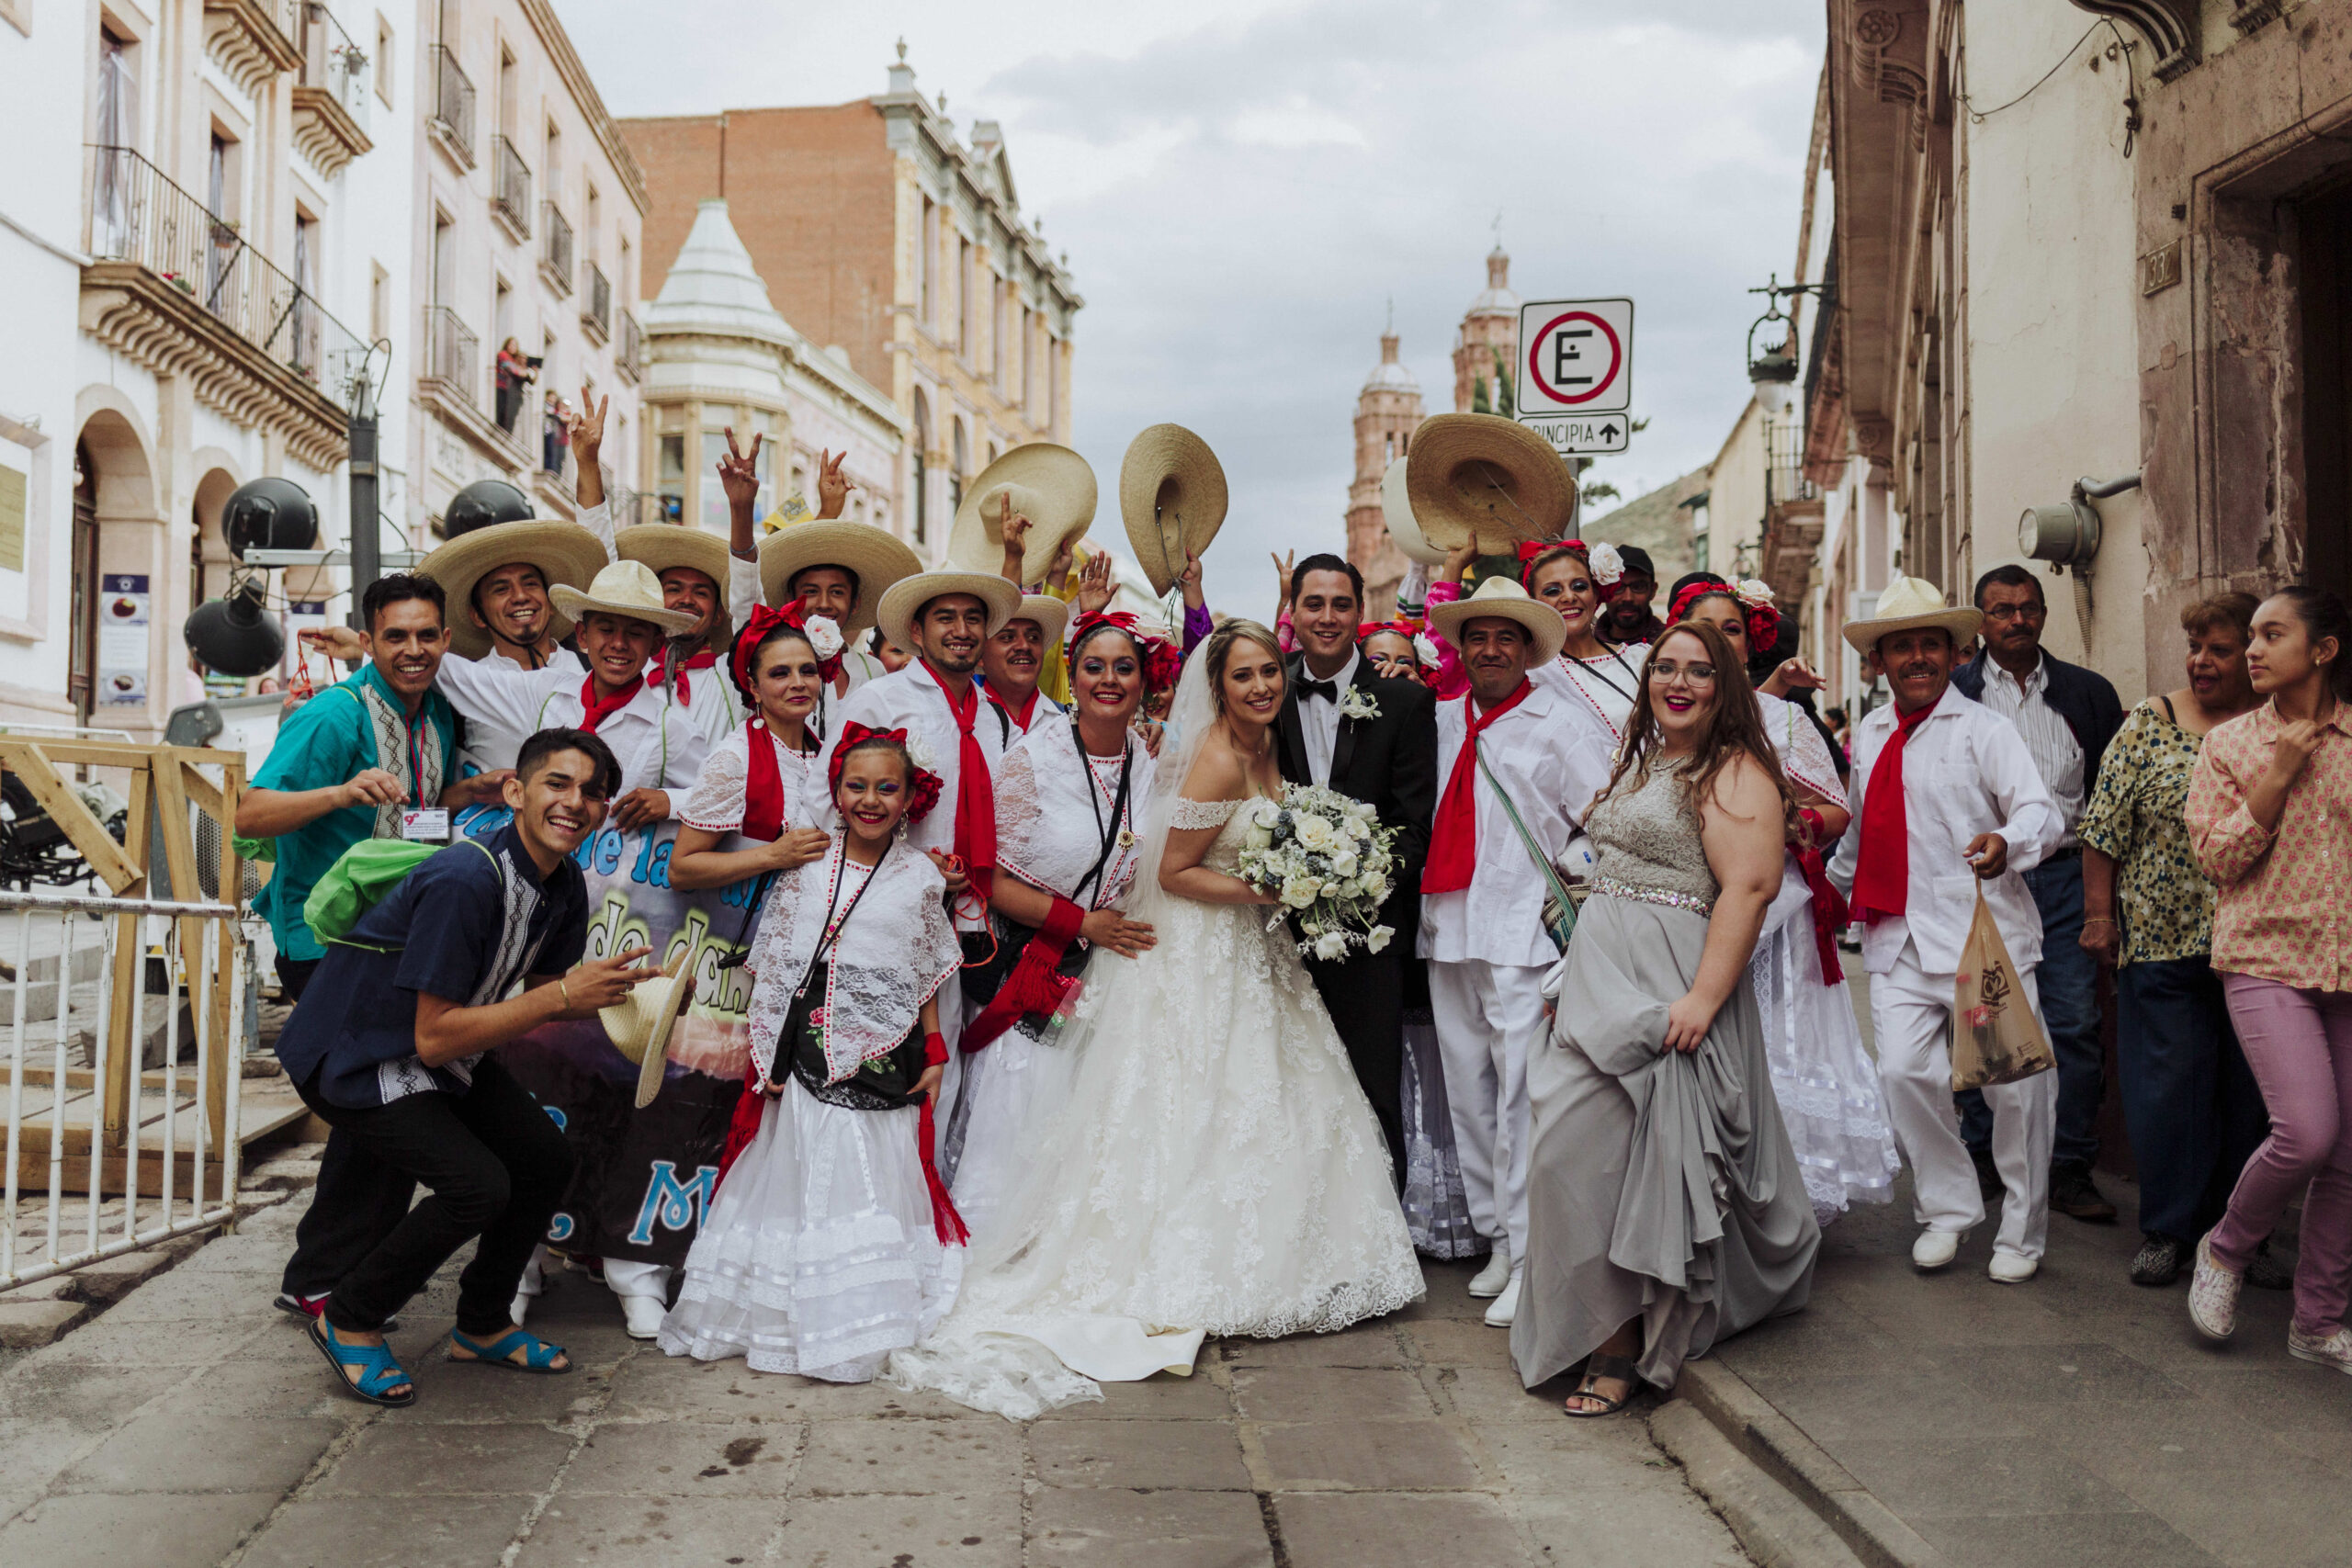 javier_noriega_fotografo_profesional_bodas_zacatecas_mexico_chihuahua_photographer49